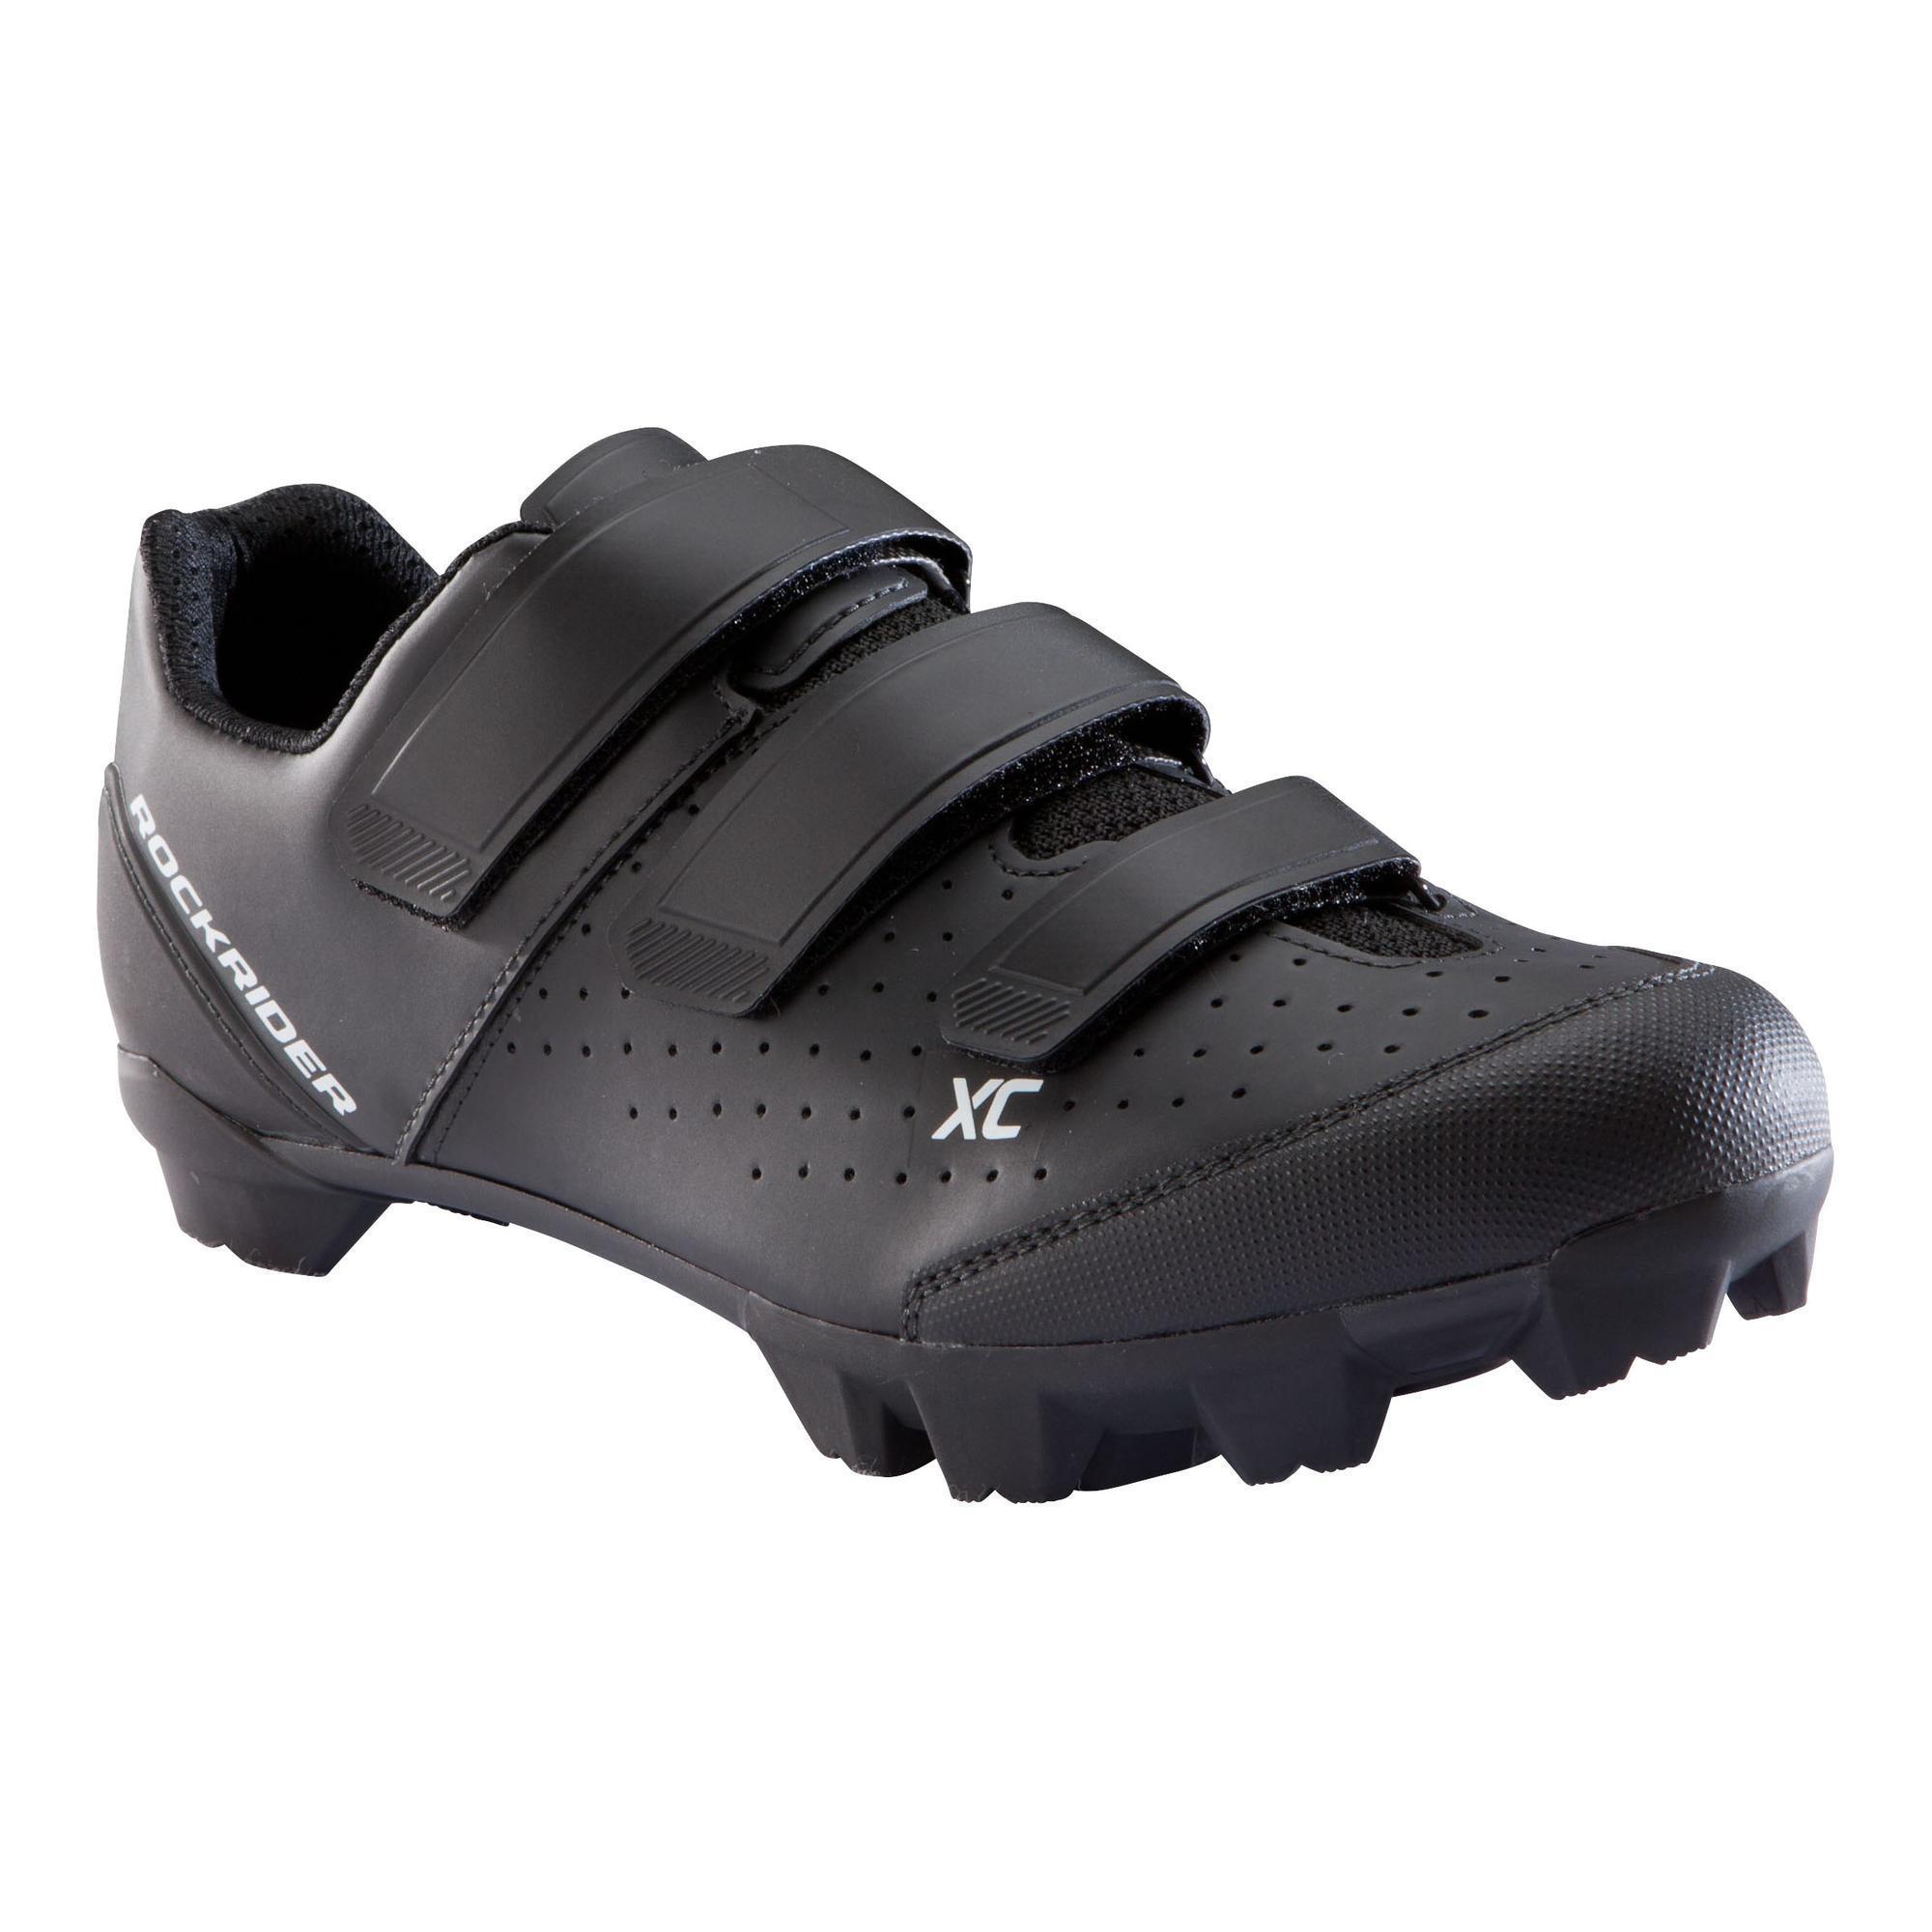 Fahrradschuhe Mountainbike XC 100 schwarz | Schuhe > Sportschuhe > Fahrradschuhe | Rockrider